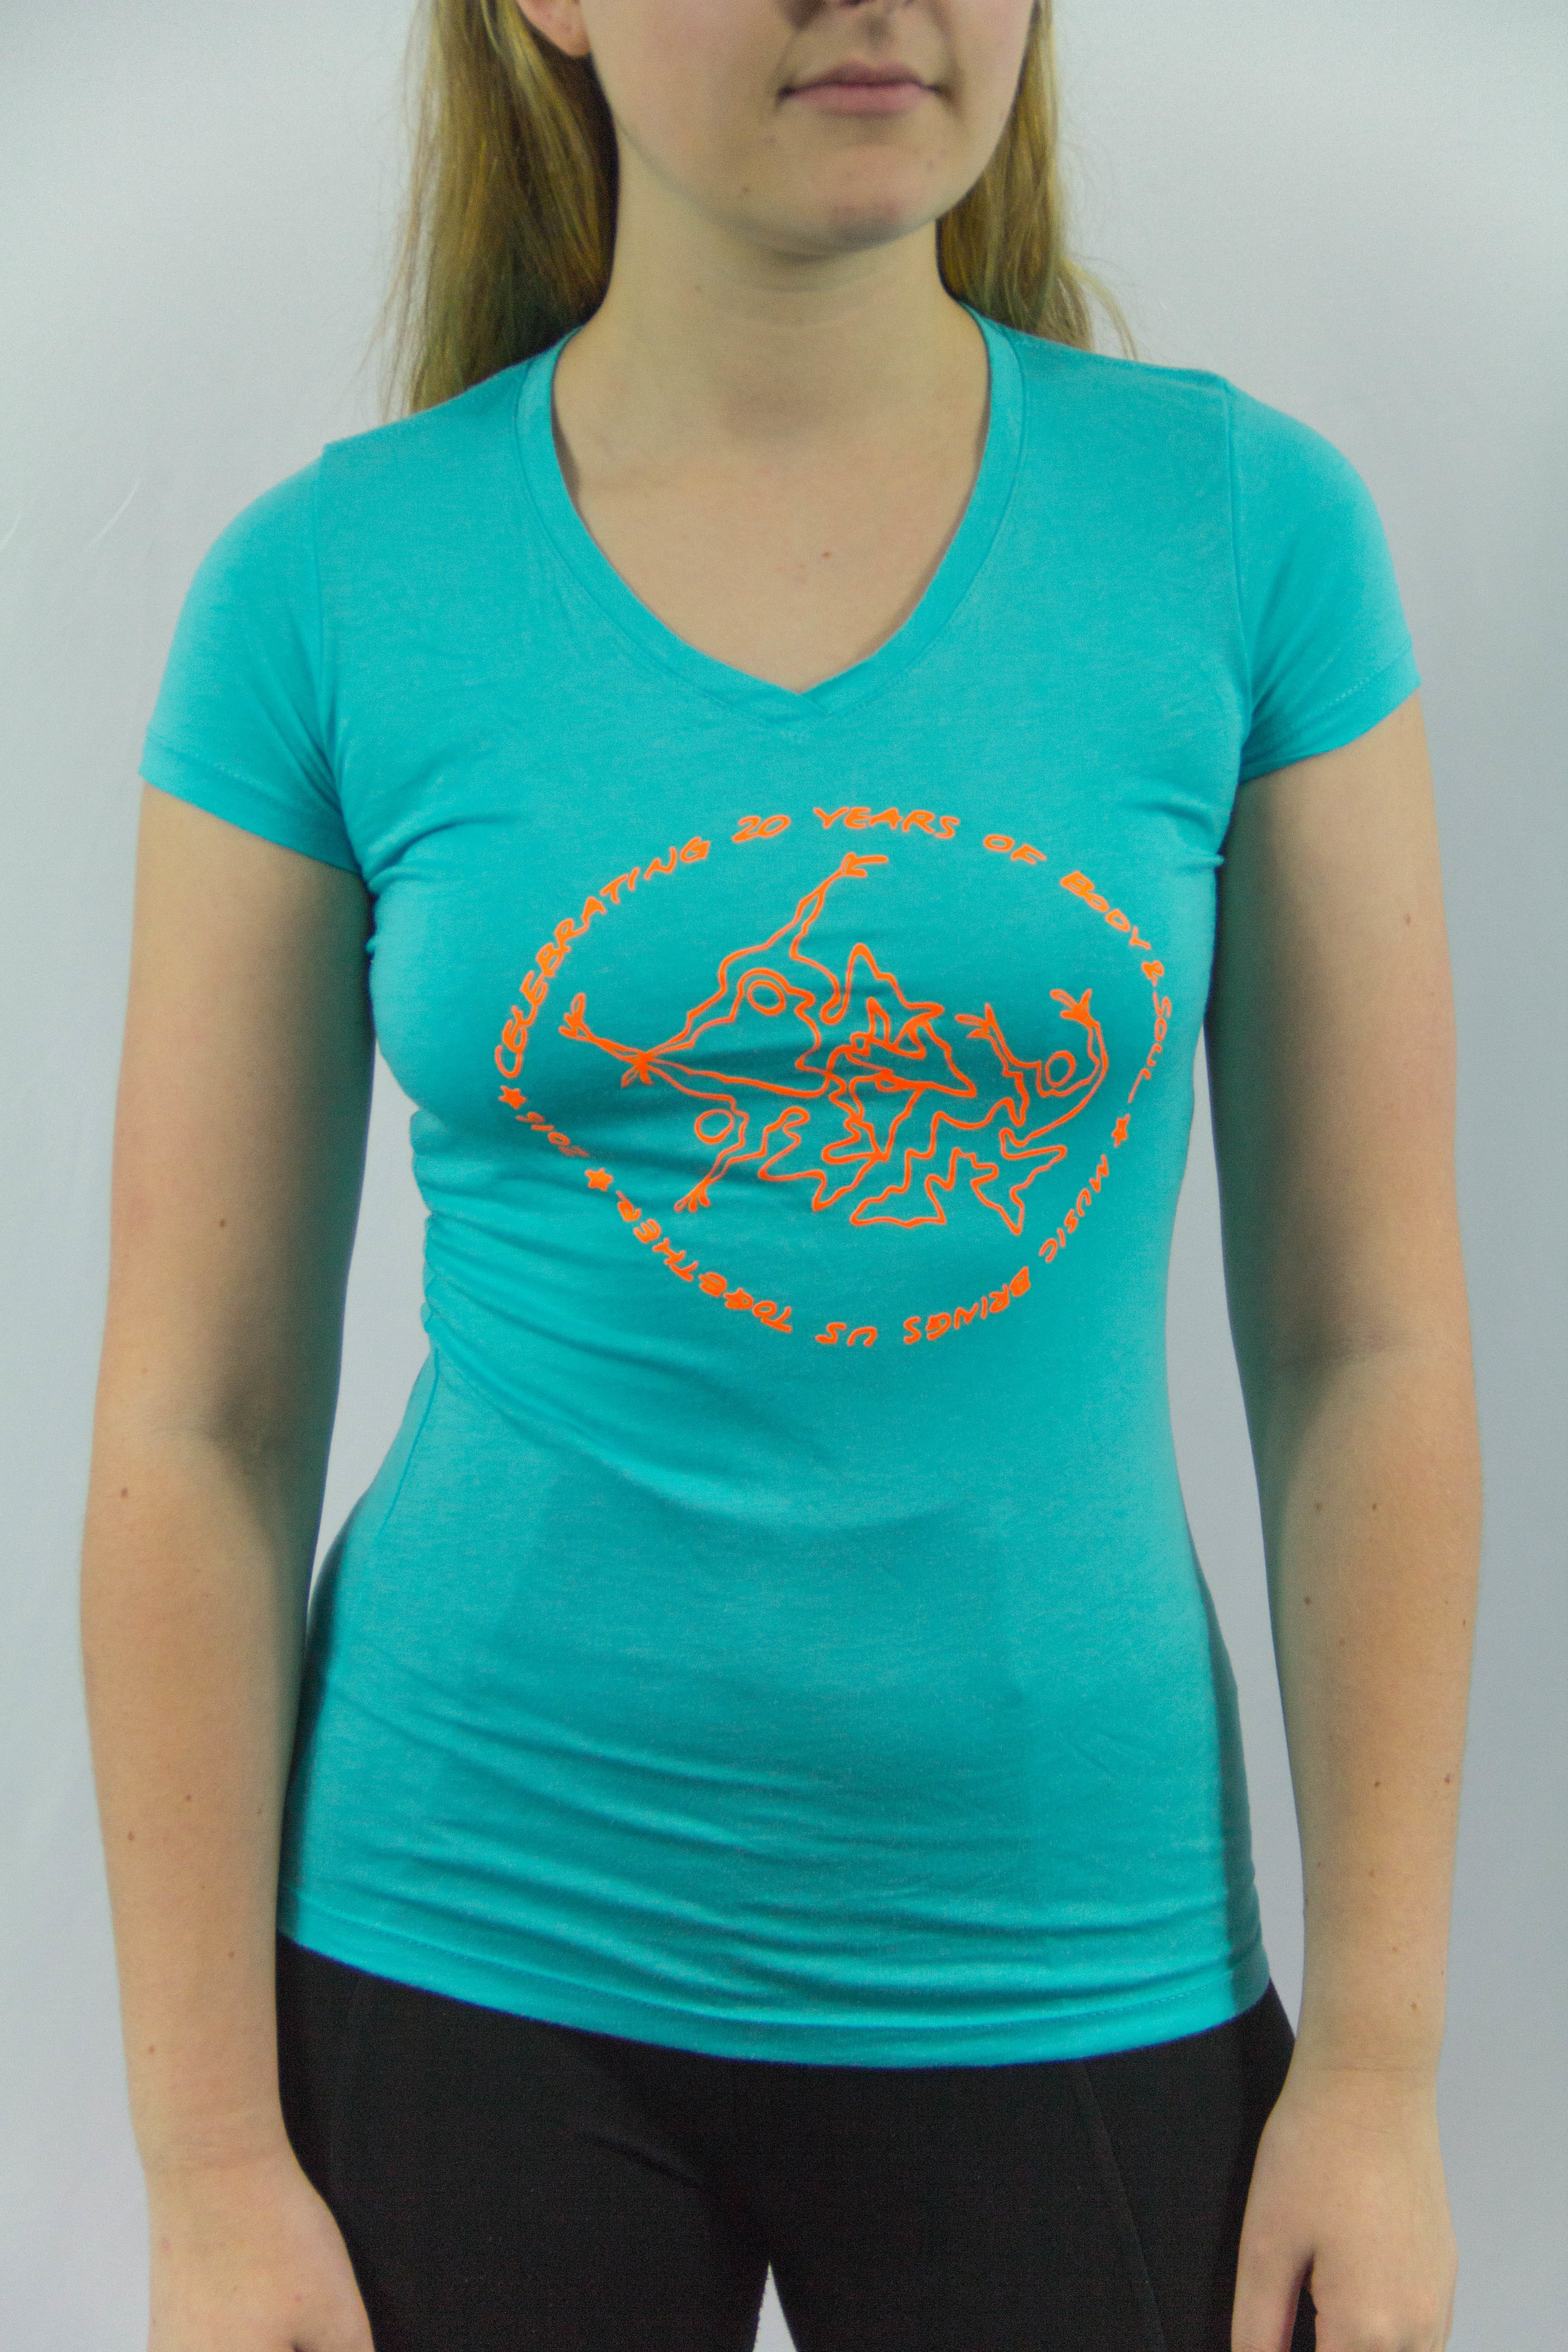 Women V-neck 20th Anniv Tahiti Blue L LIQ2HERBEBZBYMMRDNZ4MFPK